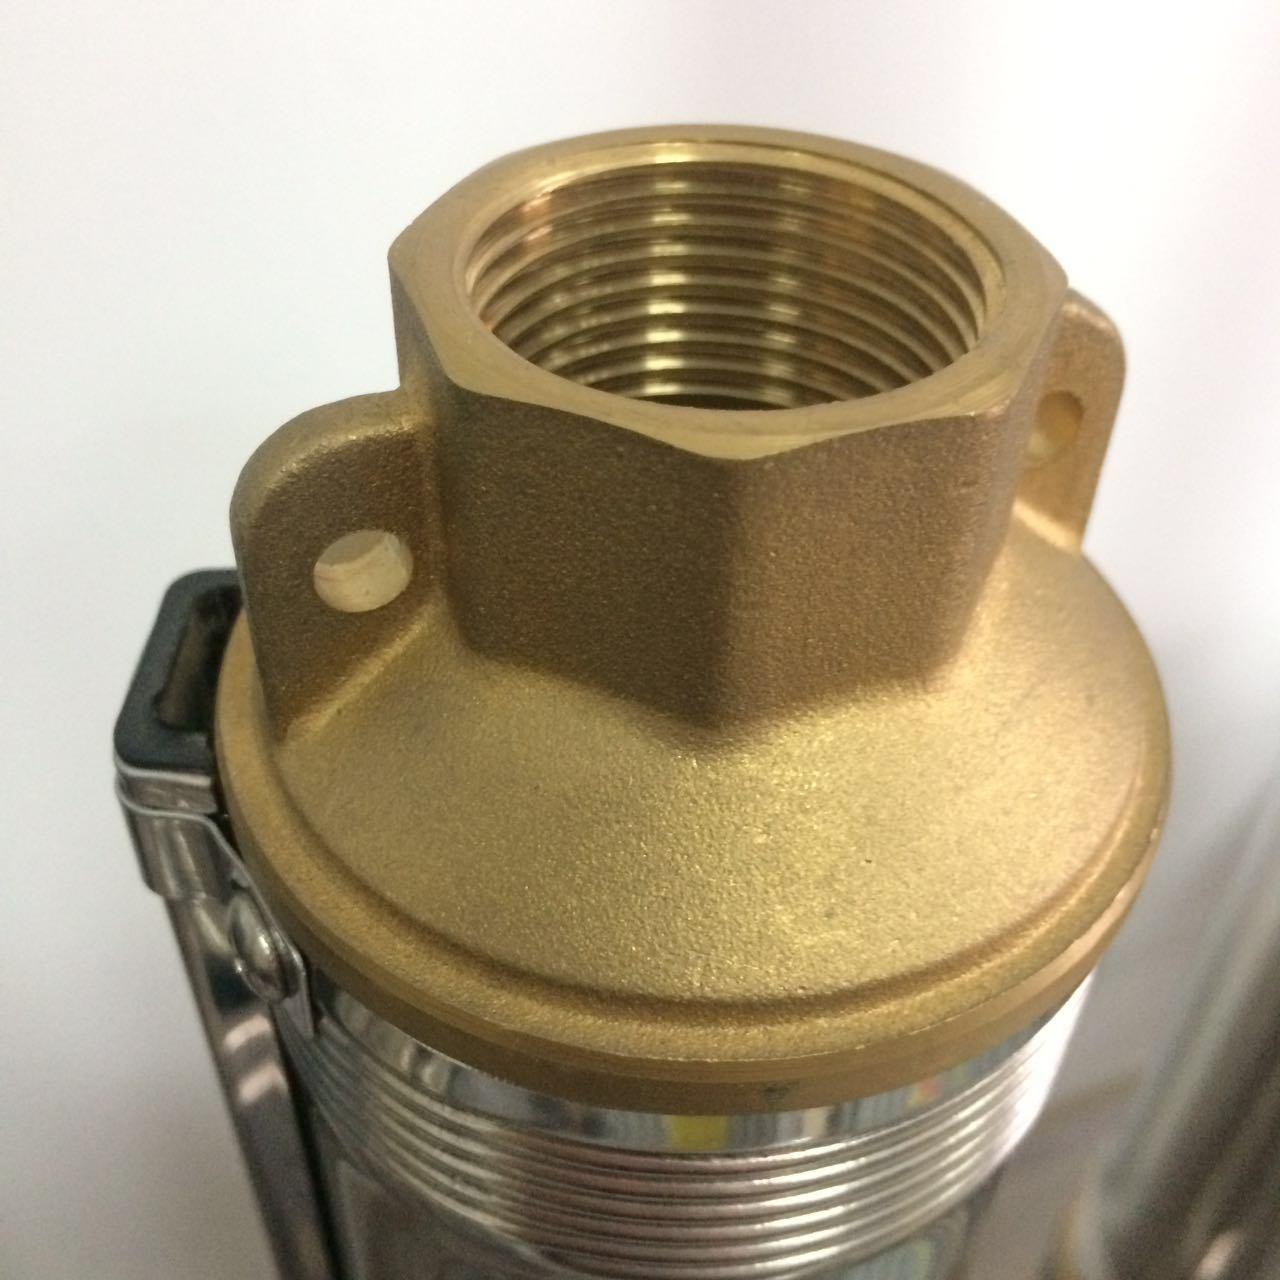 400W Solar Submersible DC Water Pump 3spc3.2/36-D36/400